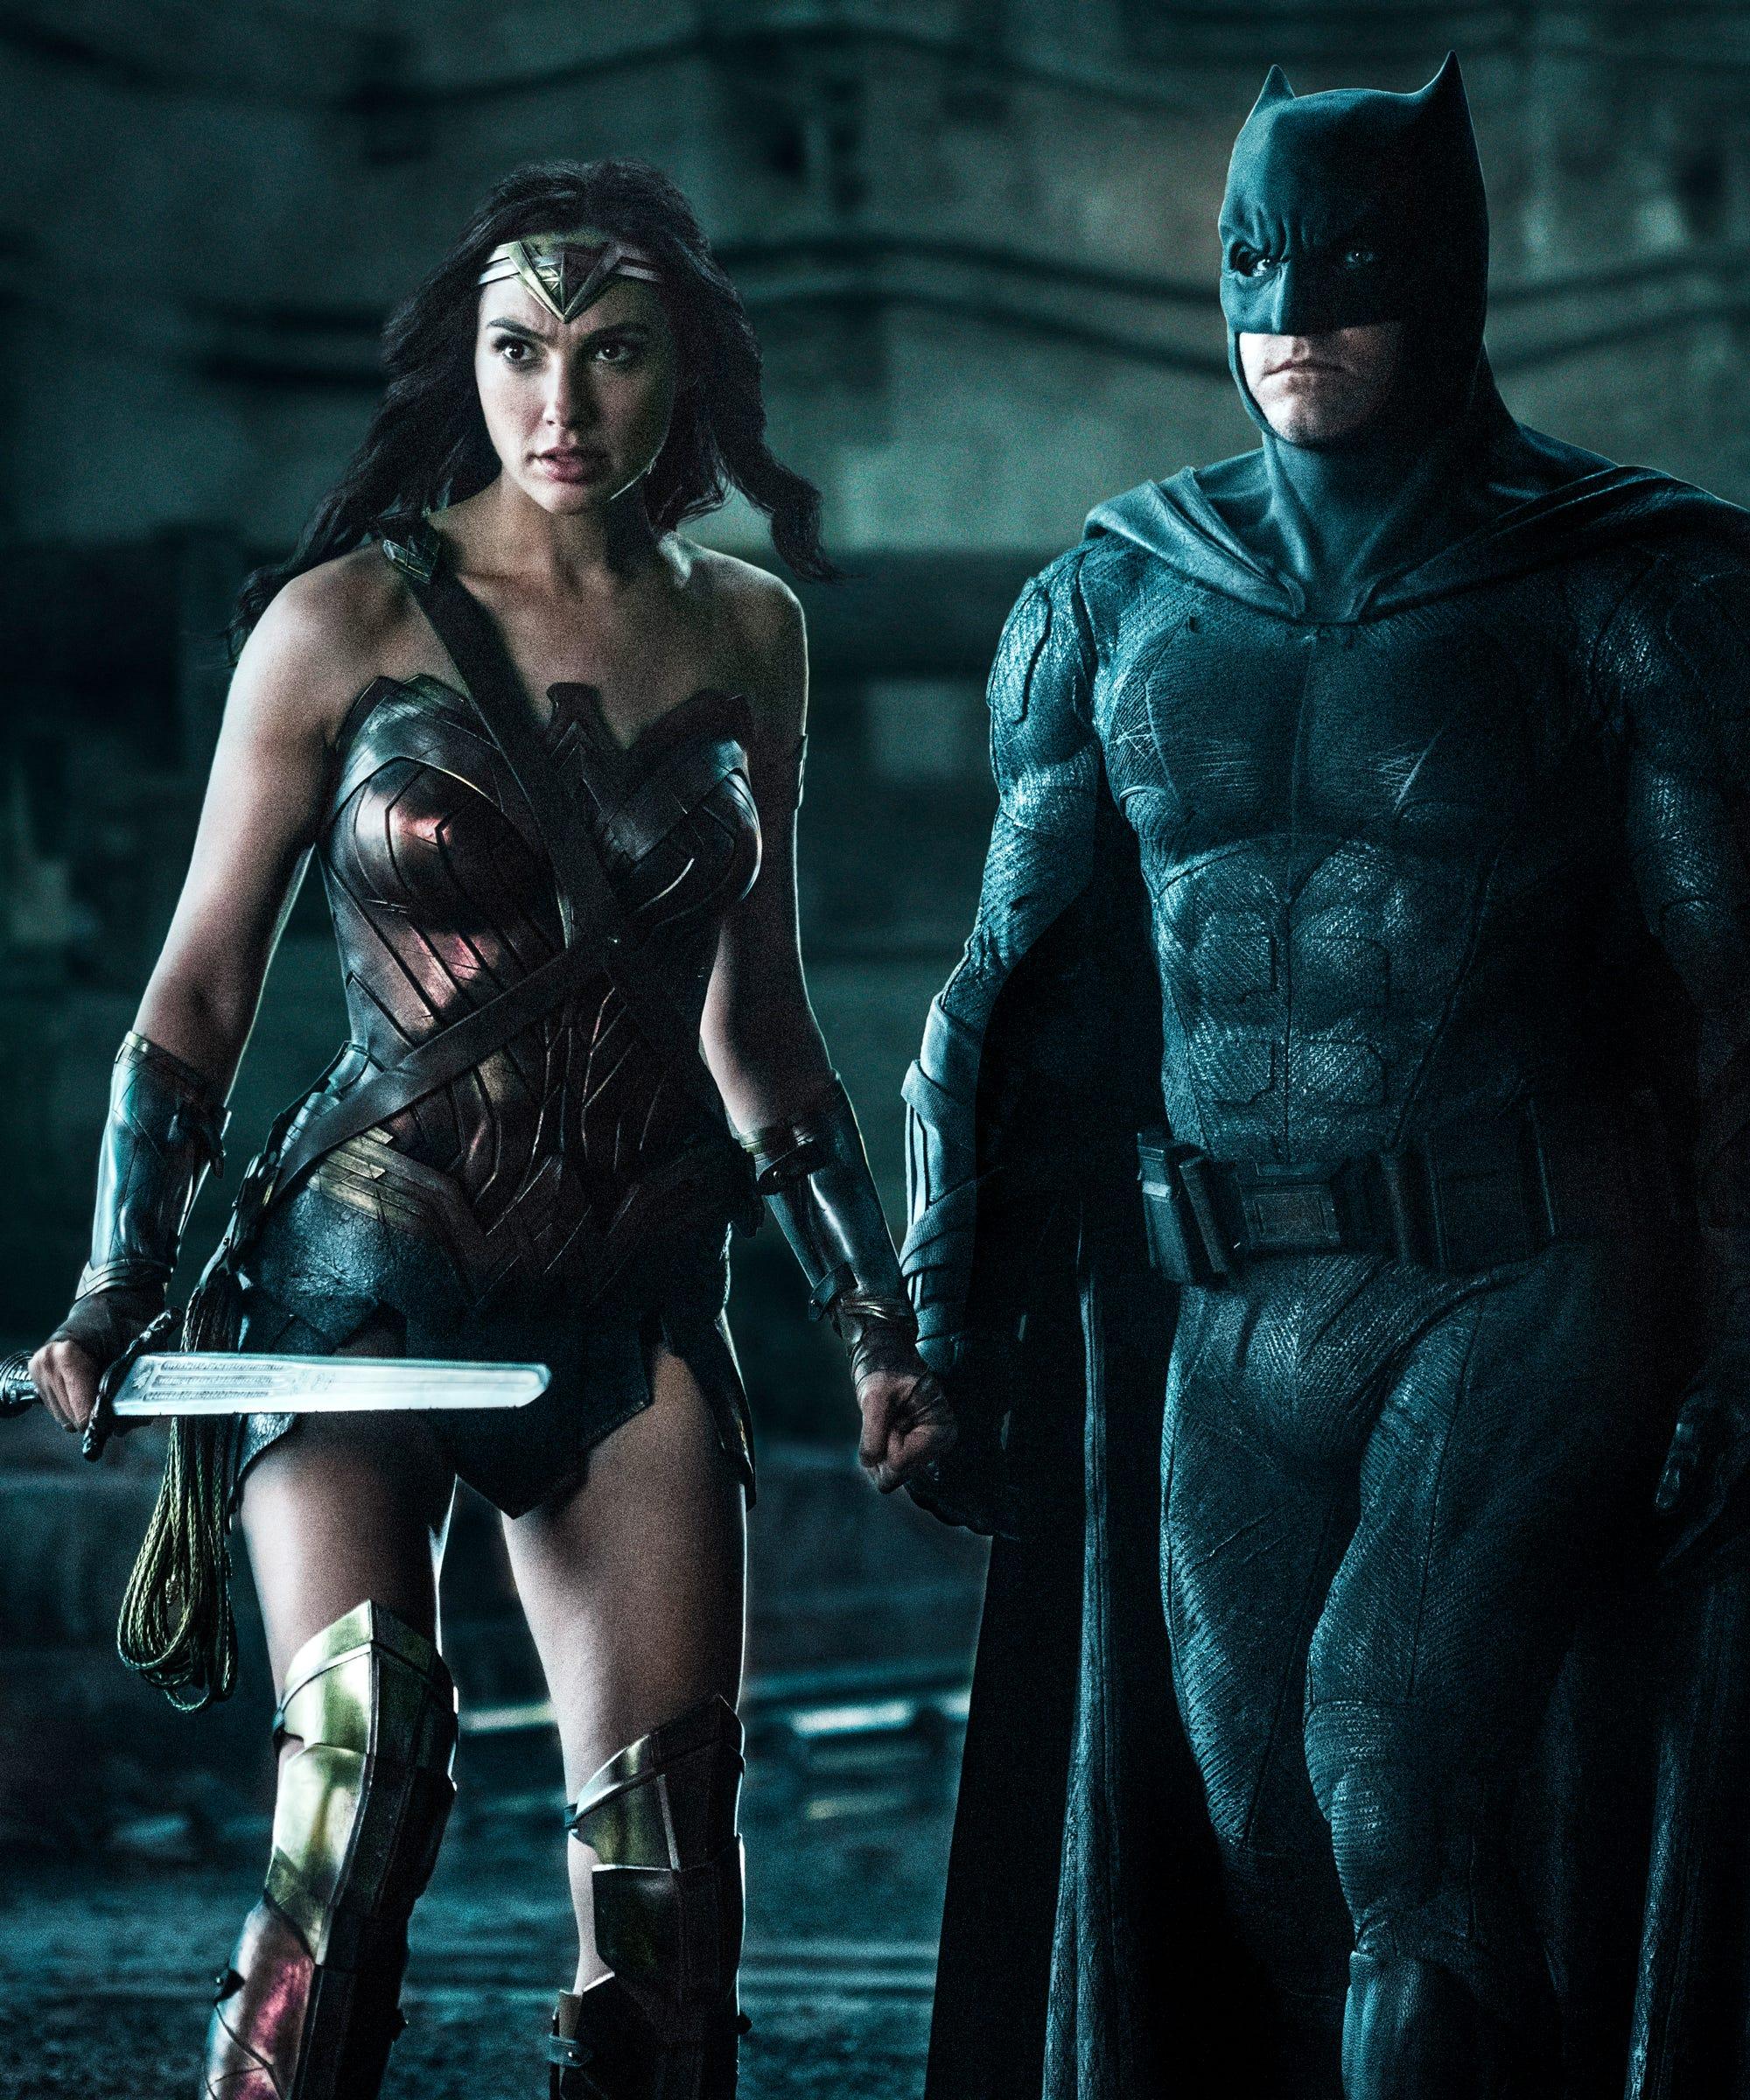 Will batman and wonder woman hook up